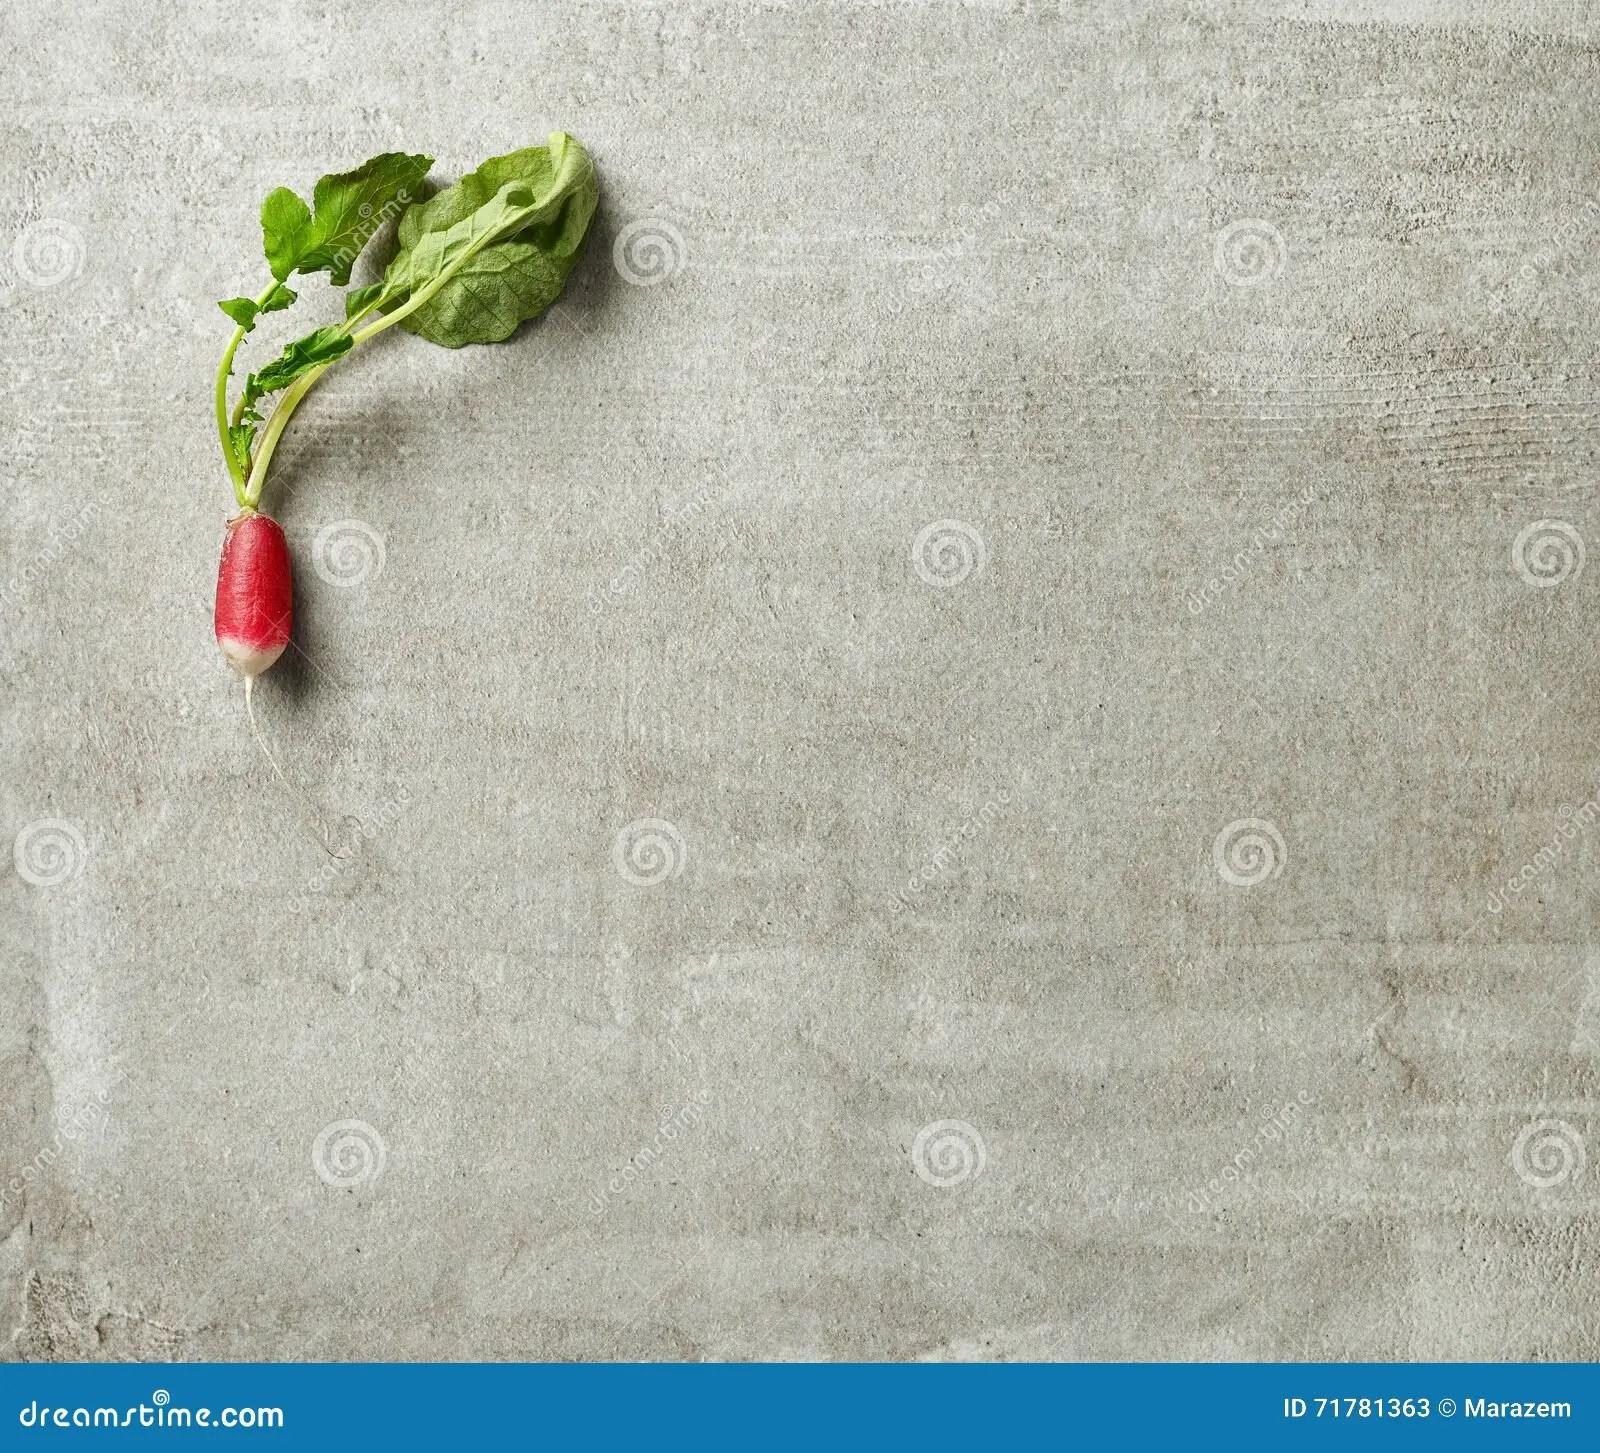 stock photo fresh raw radish gray kitchen table top view image gray kitchen table Fresh raw radish on gray kitchen table